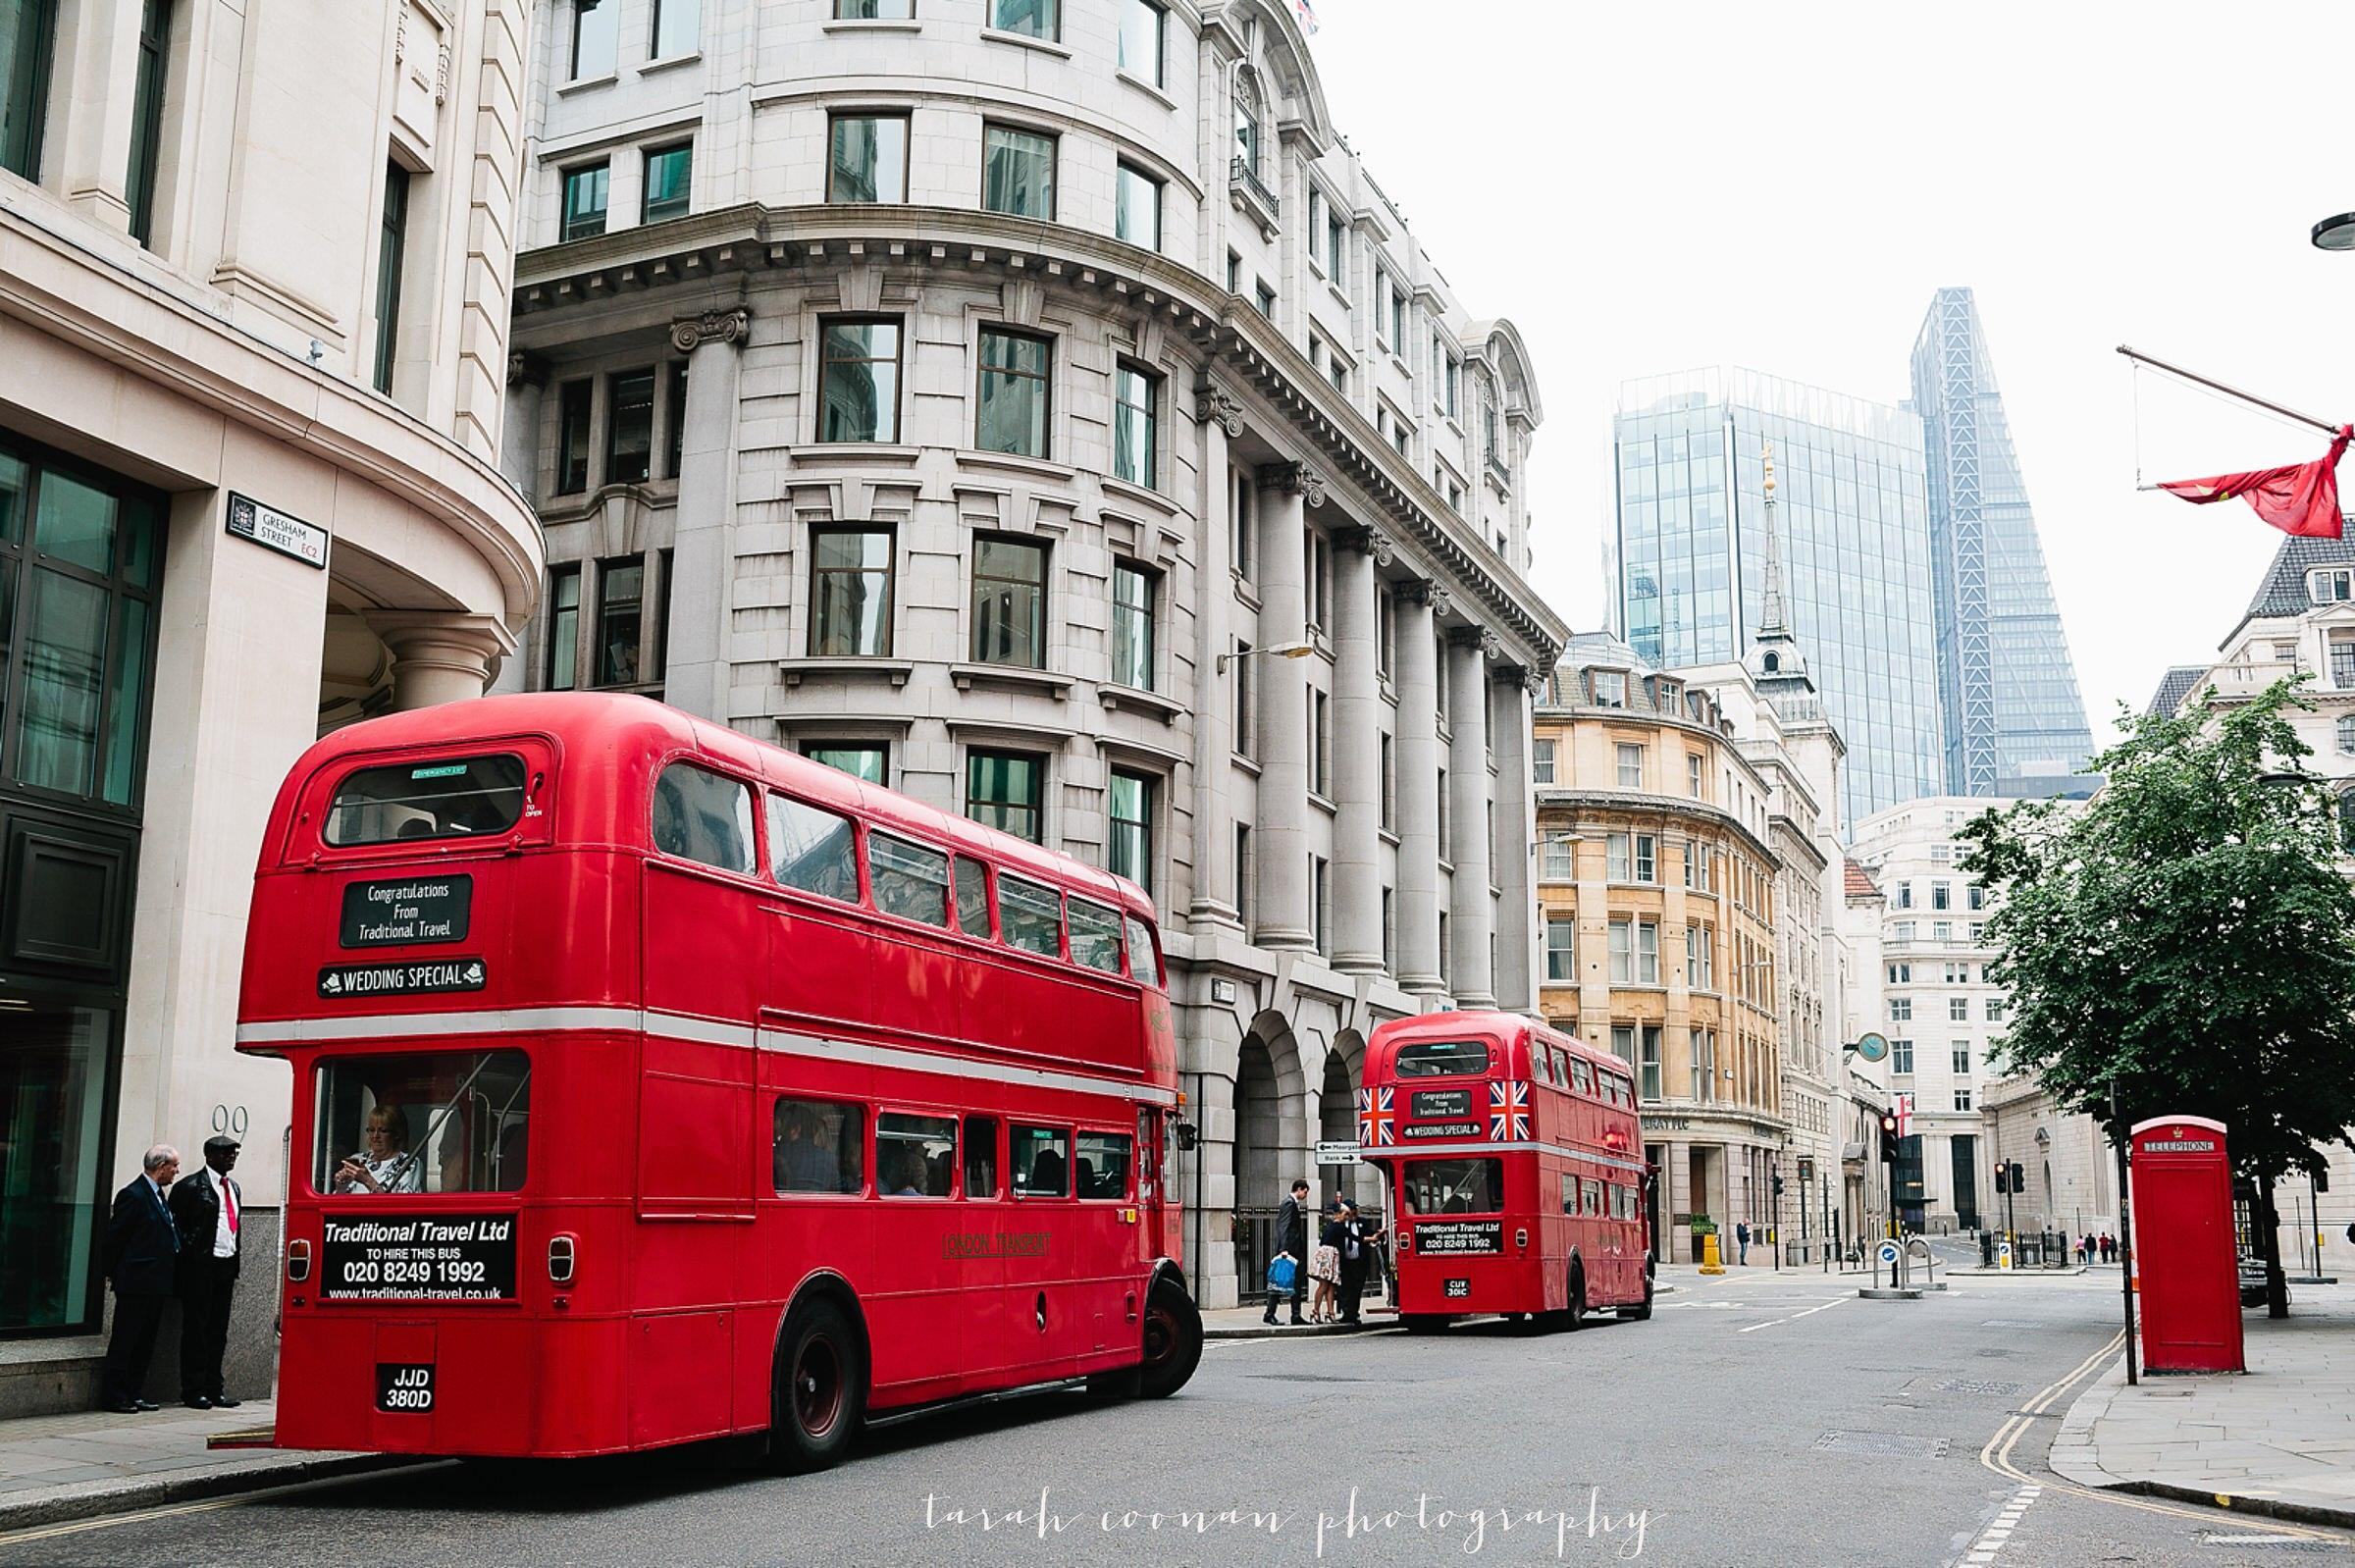 routemaster bus london wedding